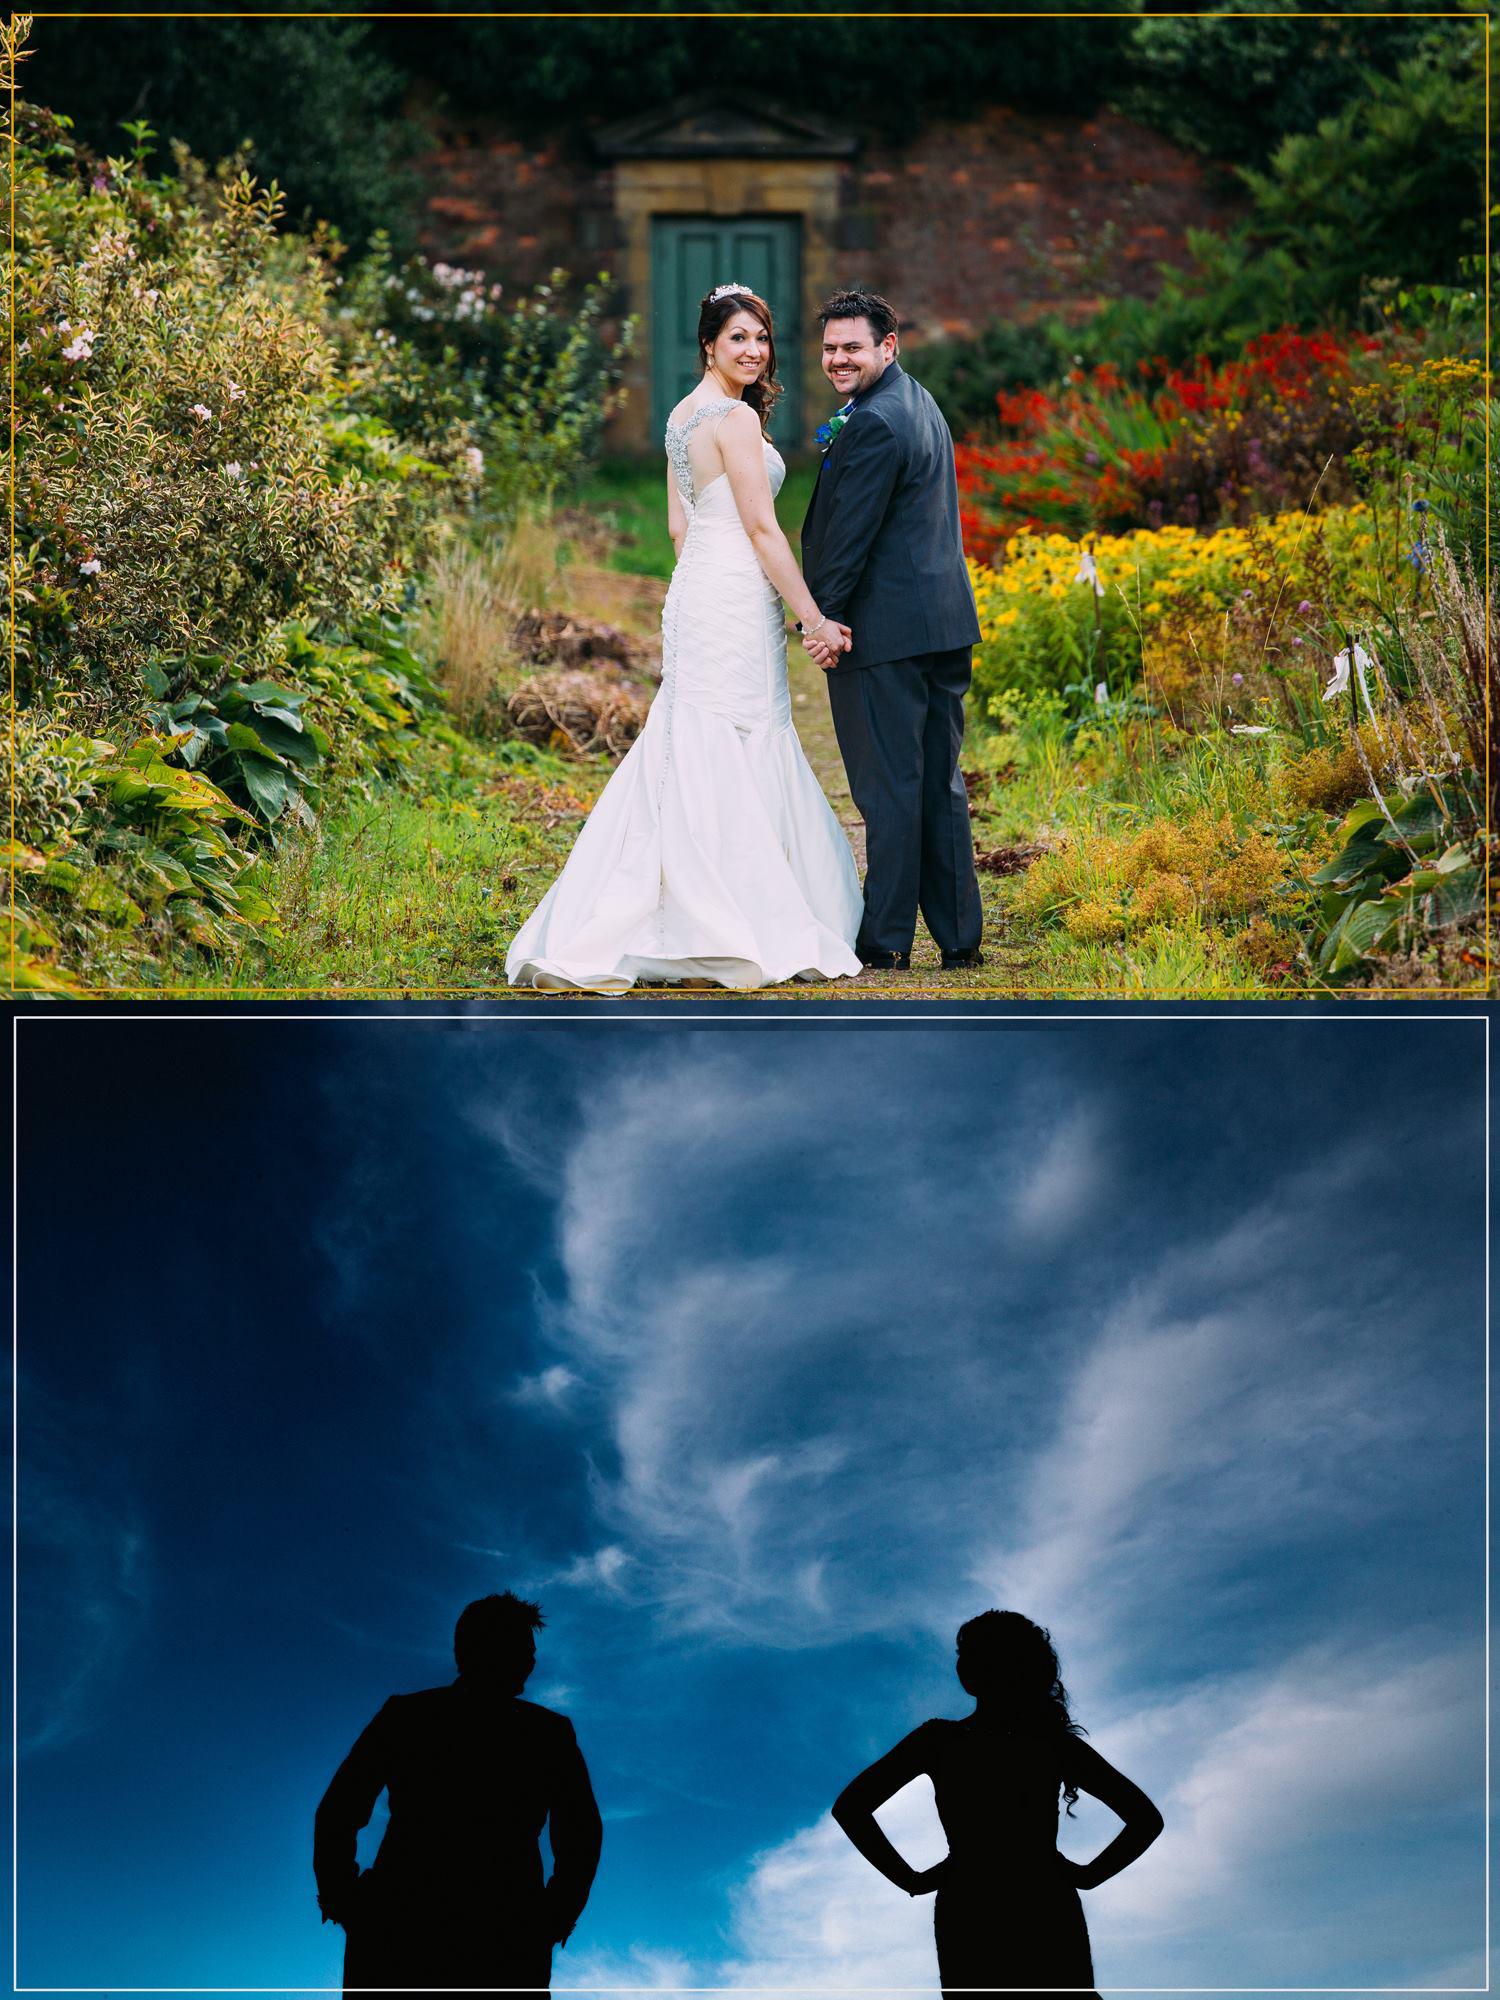 wedding photographer sheffield.jpg